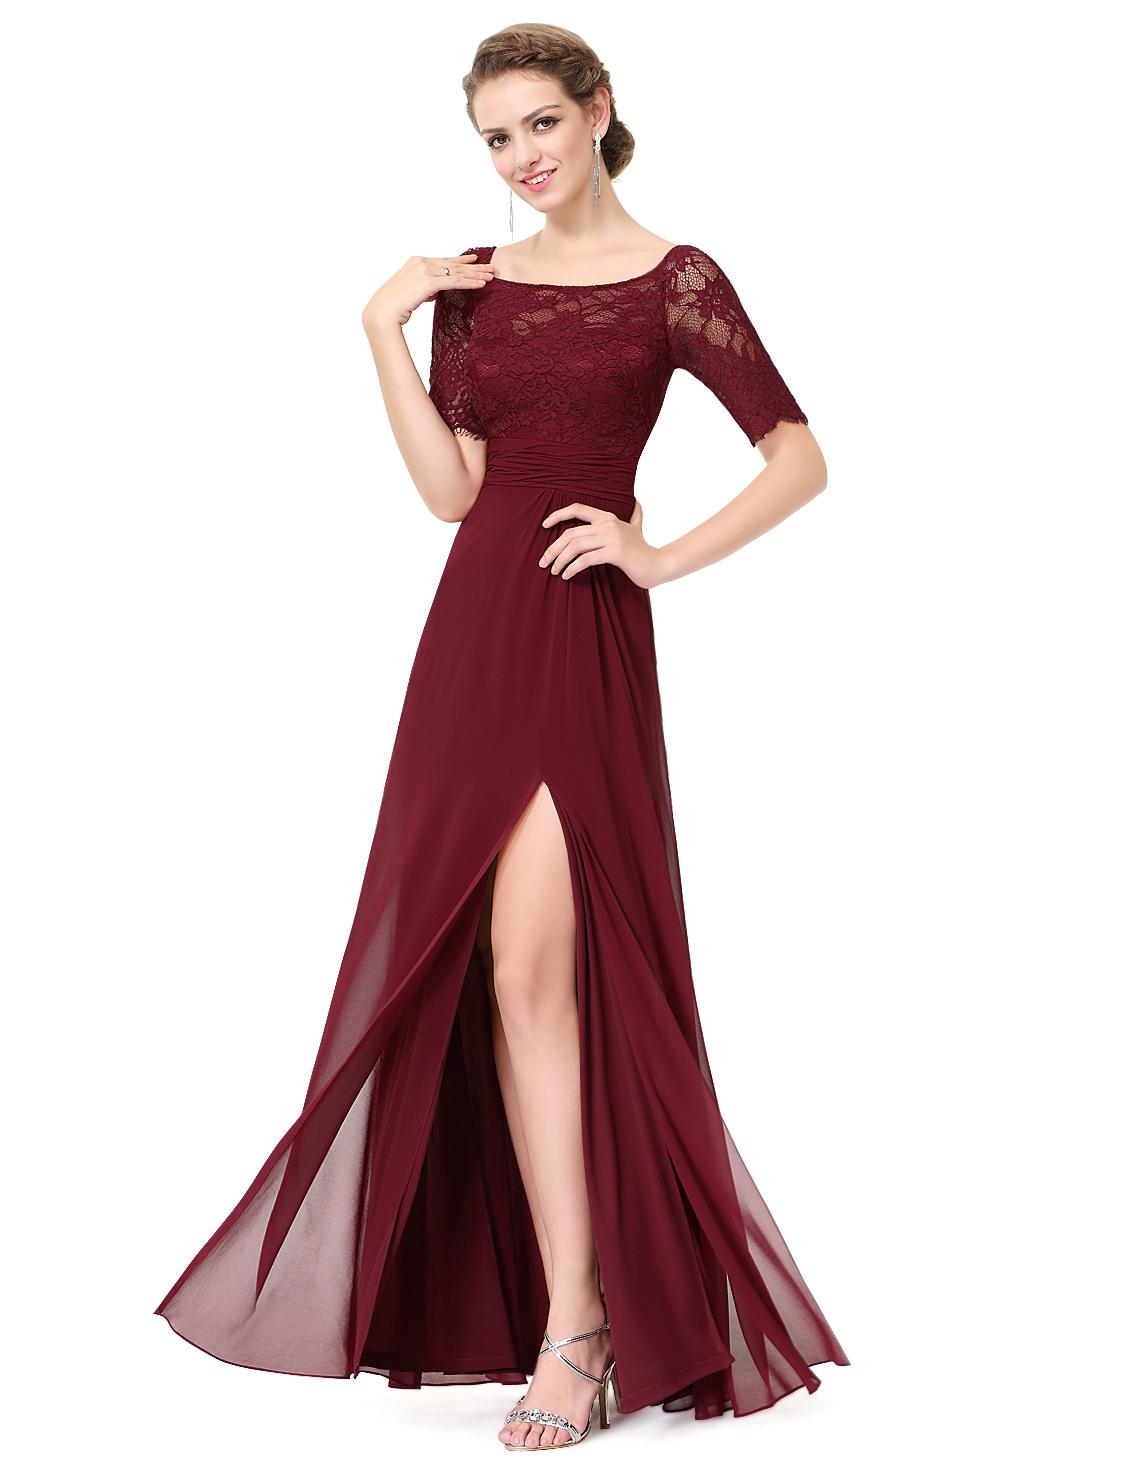 Formal Fantastisch Abendkleid Dunkelrot Boutique13 Coolste Abendkleid Dunkelrot Design